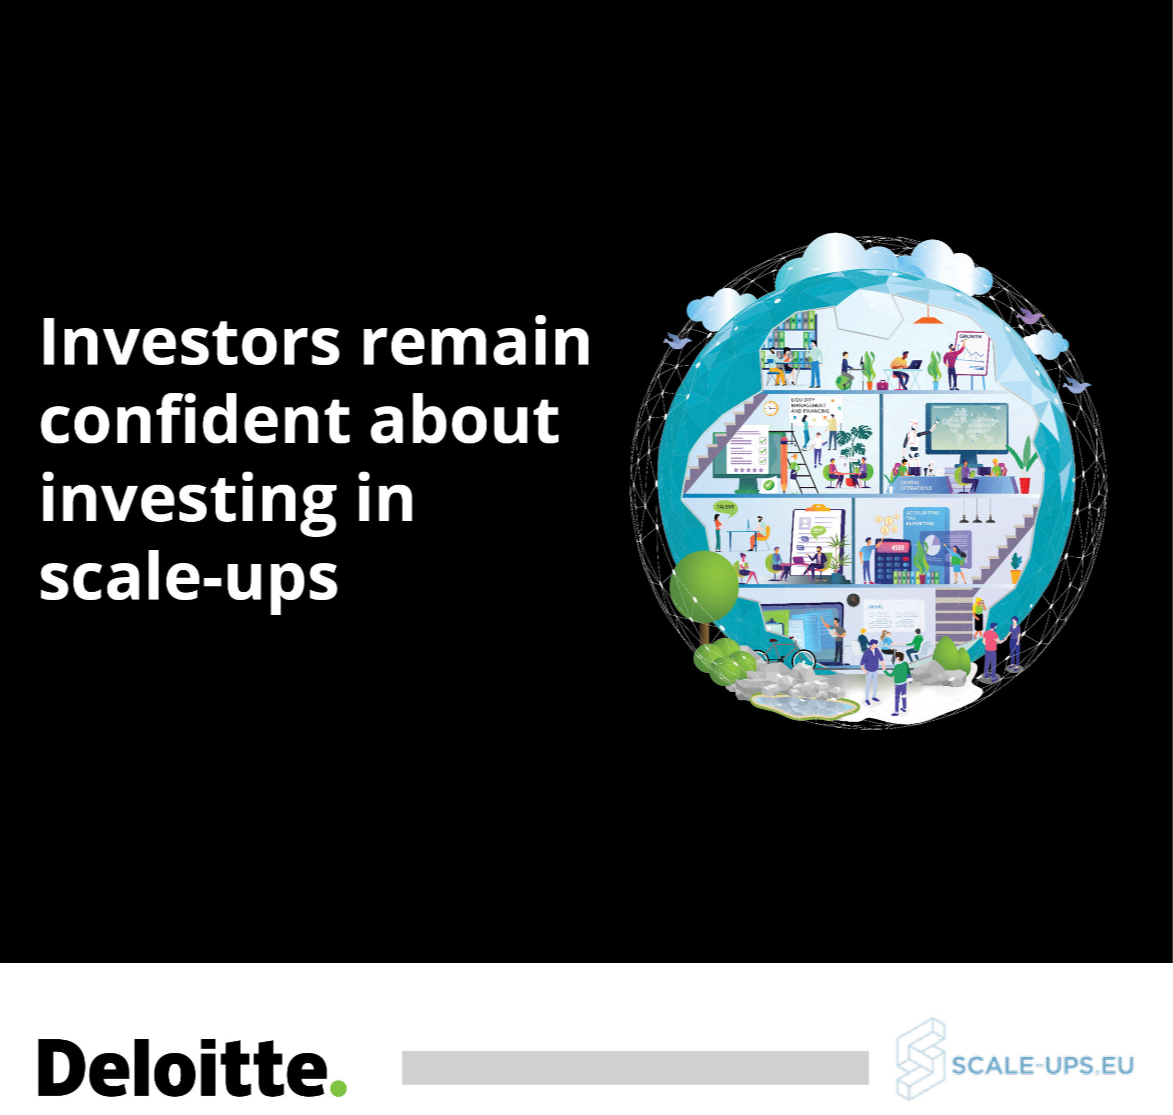 Deloitte Investor Survey 2020